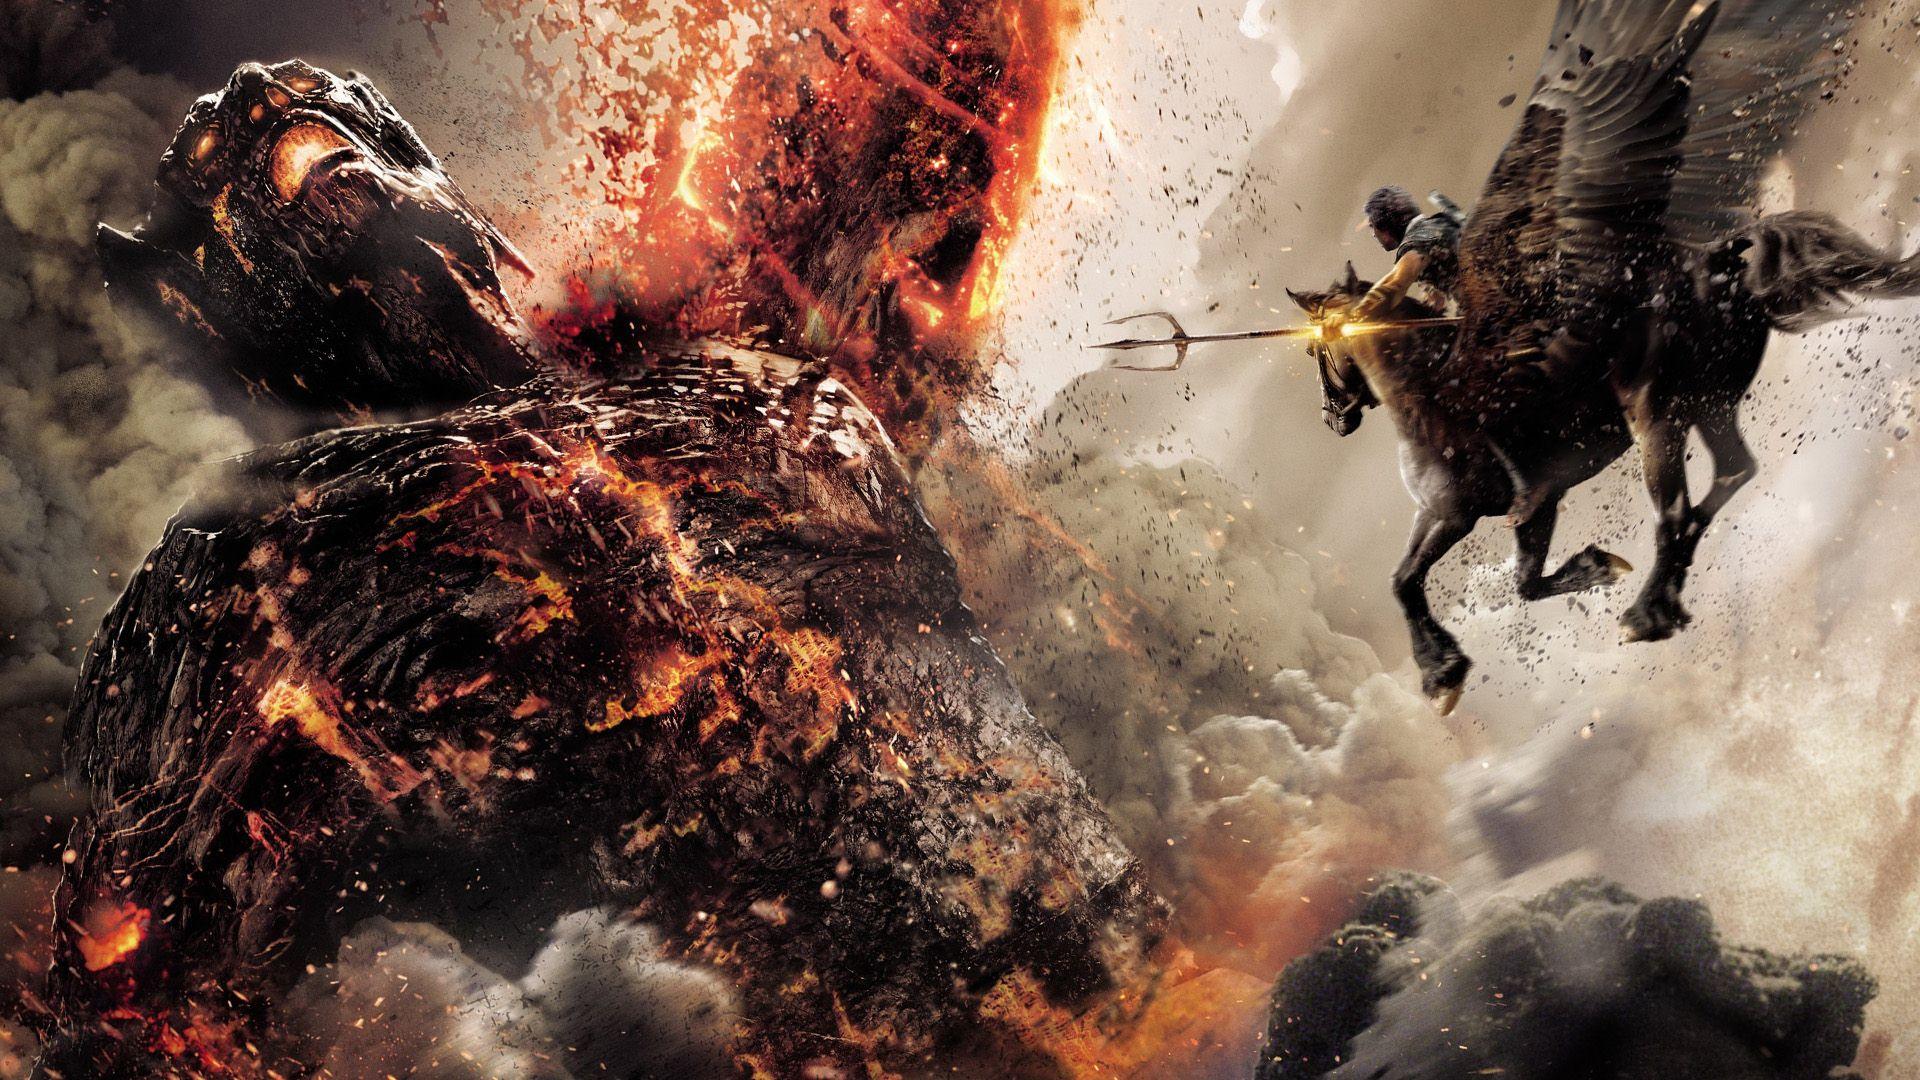 Wrath of The Titans Wallpaper 58195 1920x1080px 1920x1080